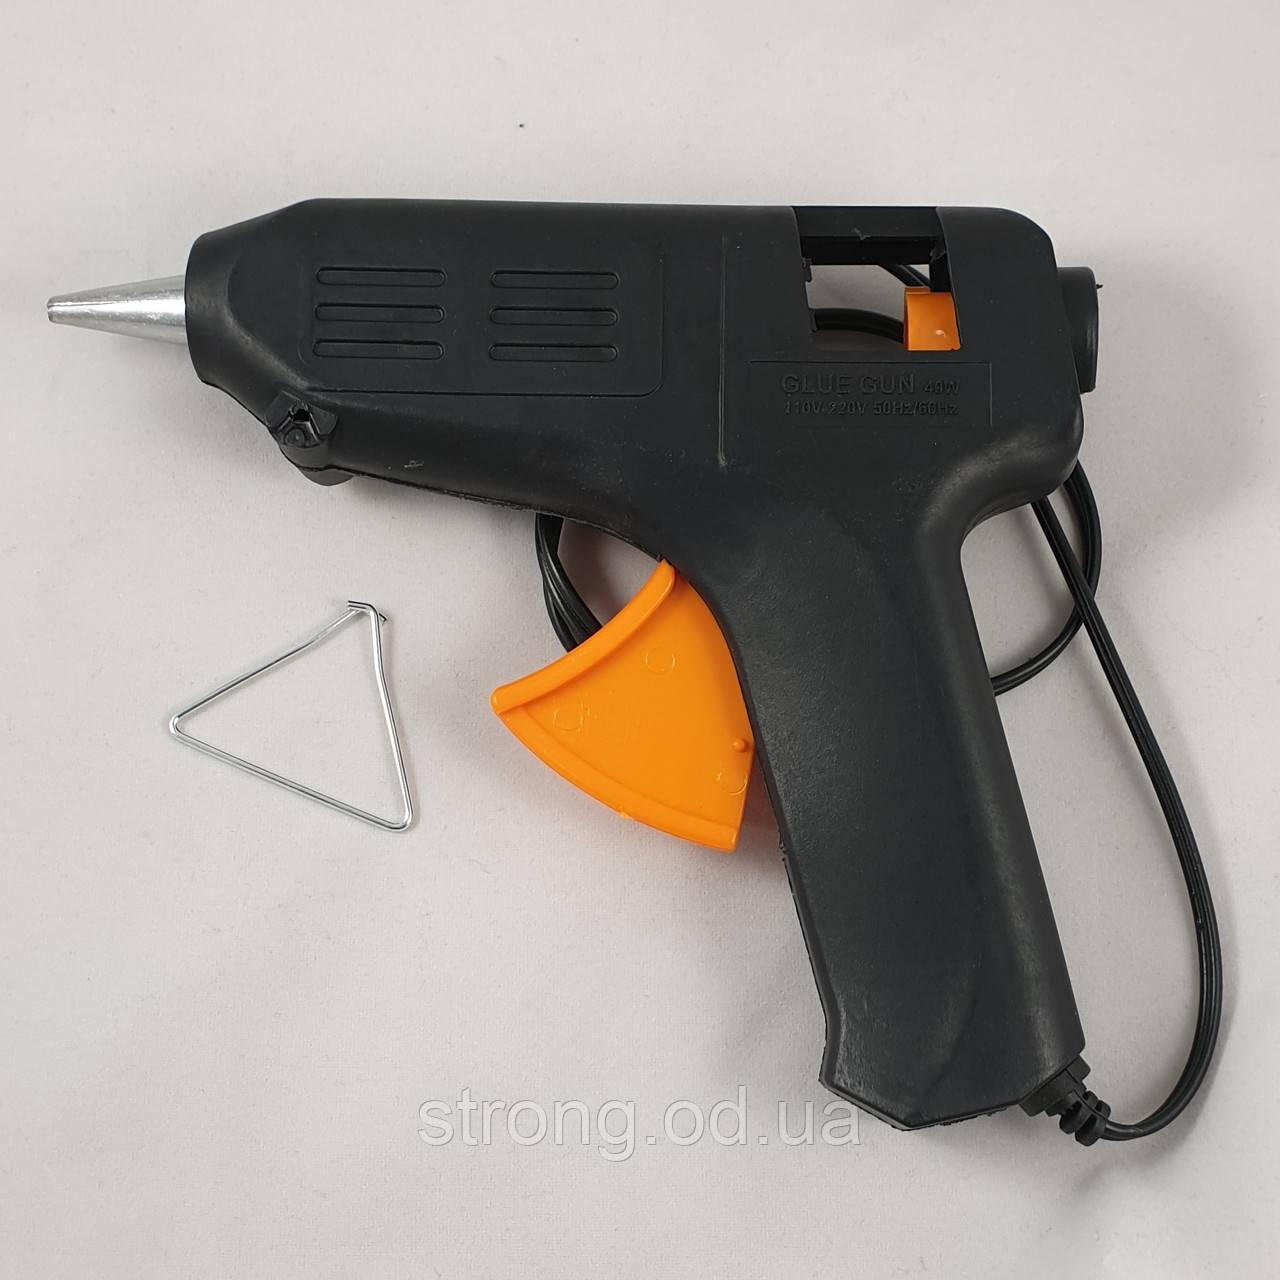 Пистолет Tермоклеевой. 40w стержни 11мм.